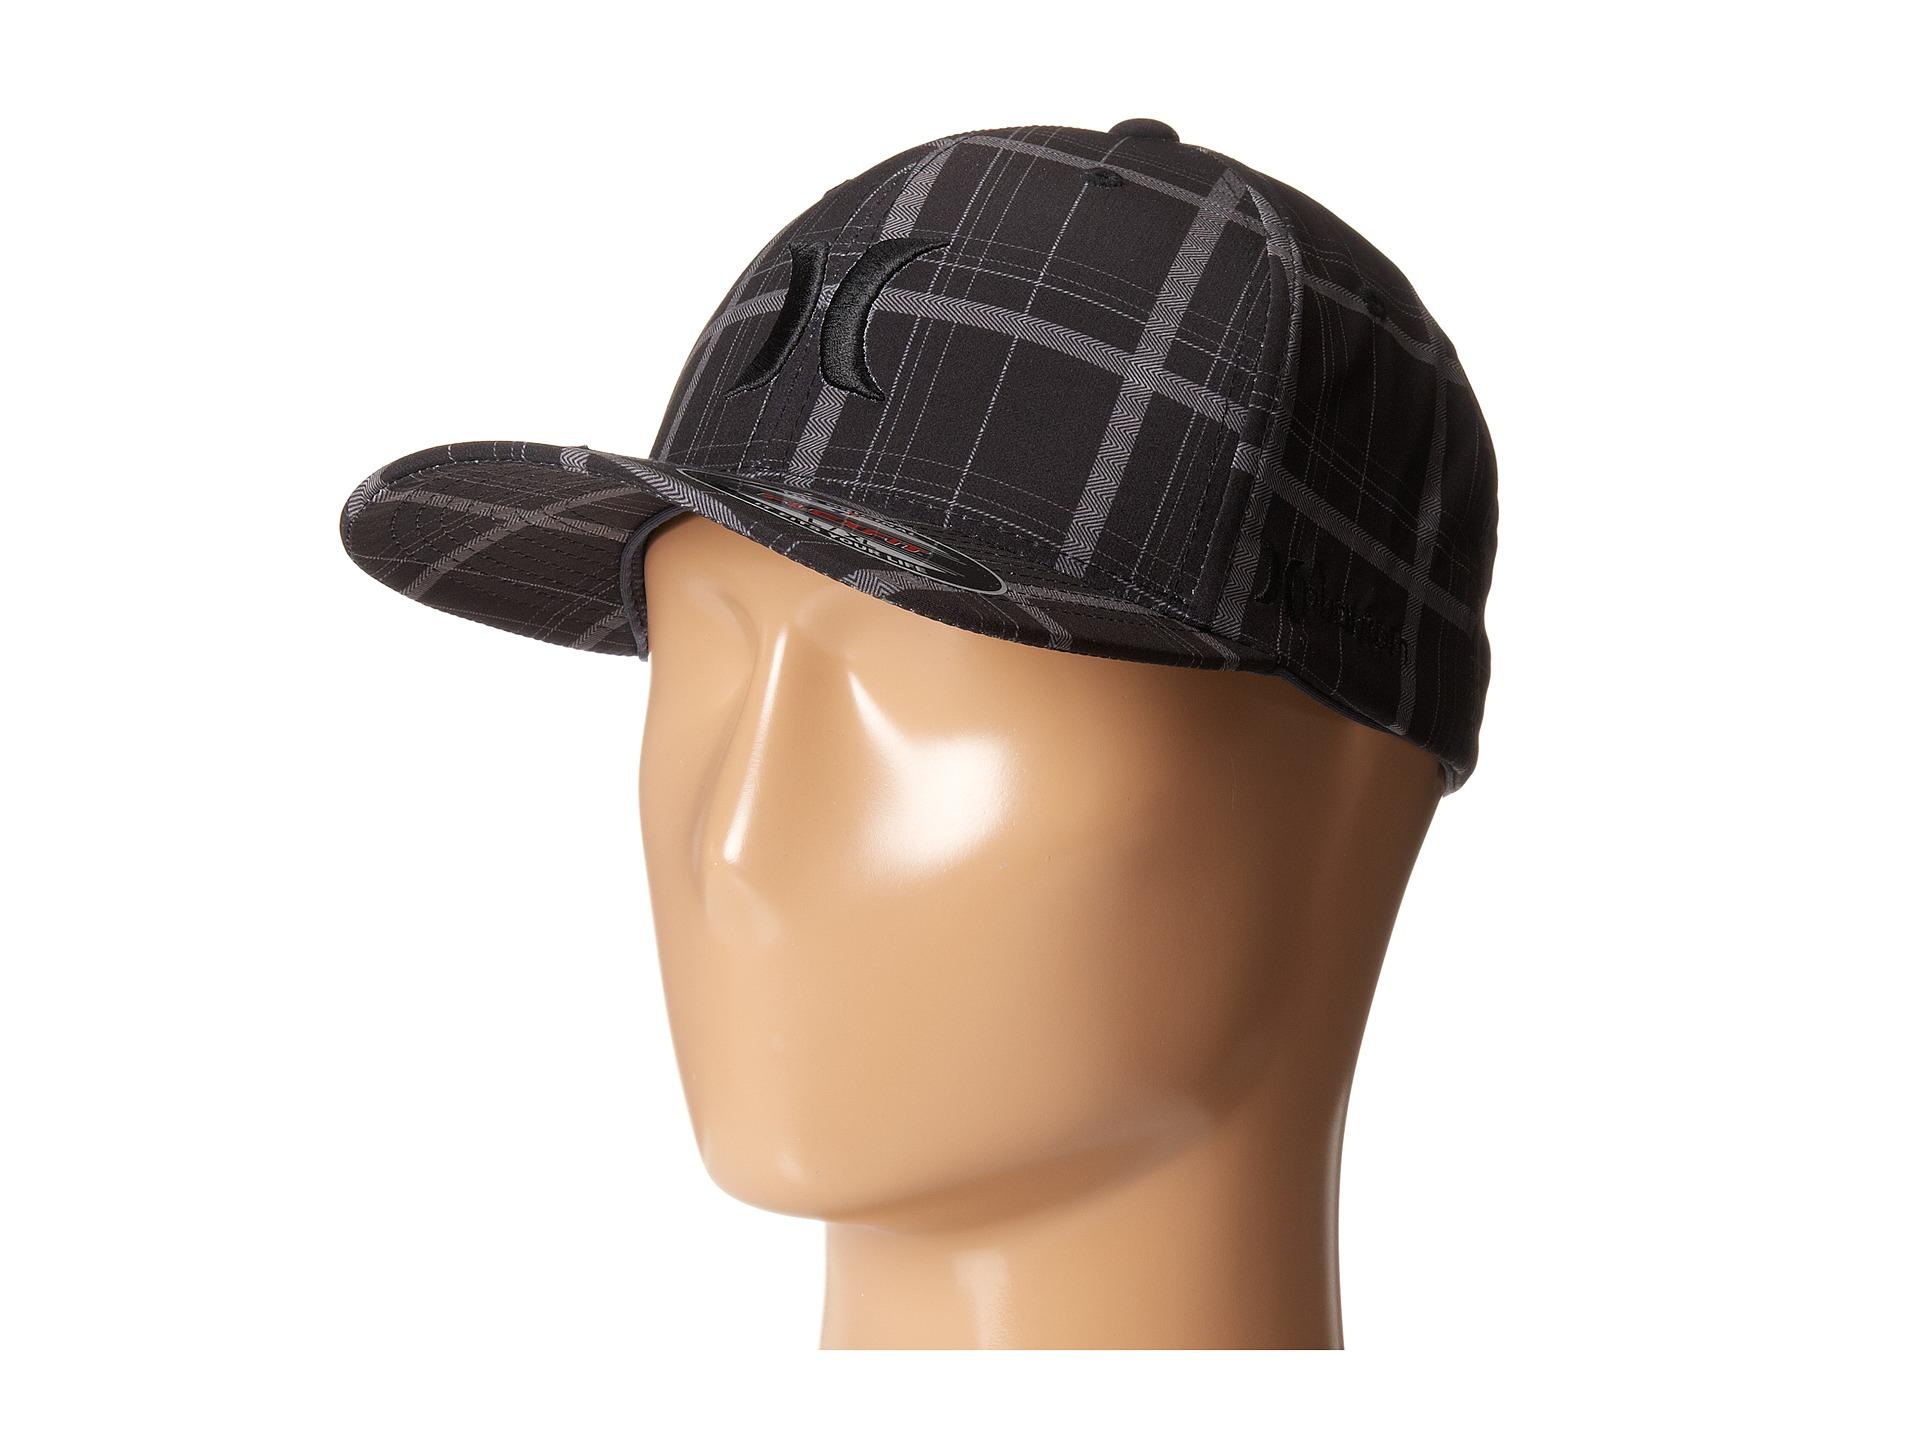 Lyst - Hurley Phantom Plaid Flexfit Permacurve Hat in Black for Men 63d8548c1f3